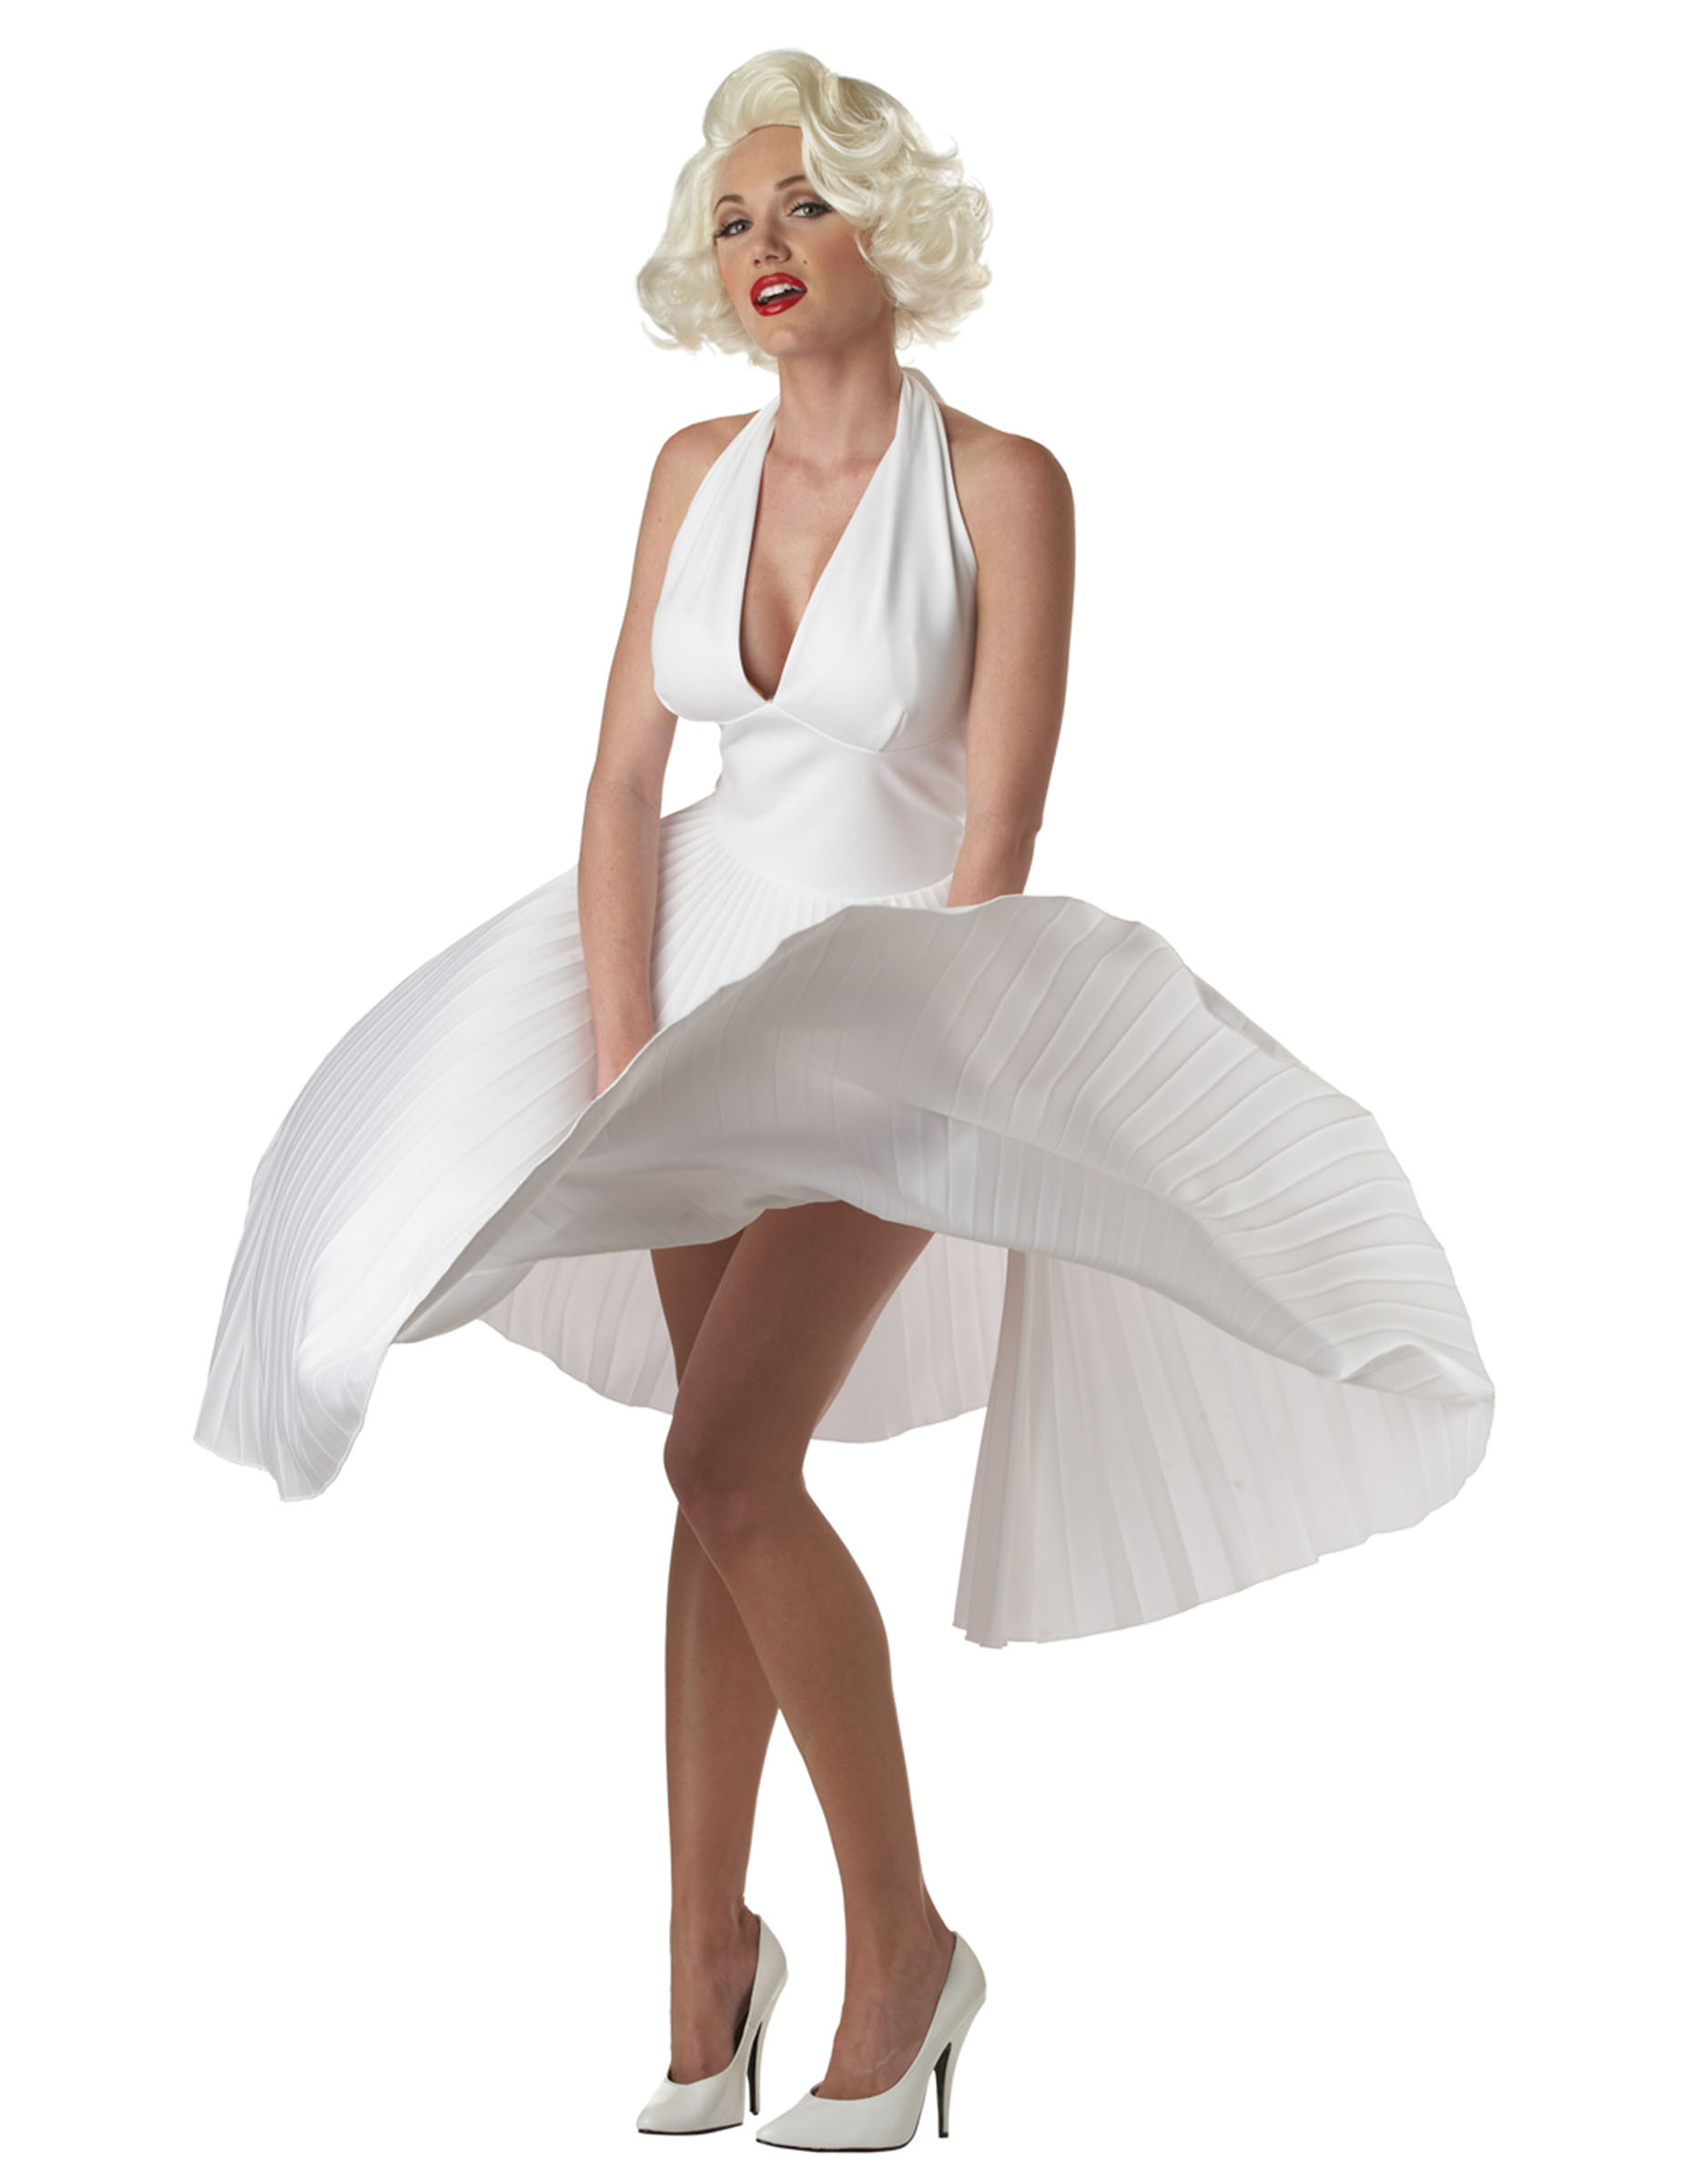 De Luxe Marilyn-Kostüm für Damen - M (40/42) 81071